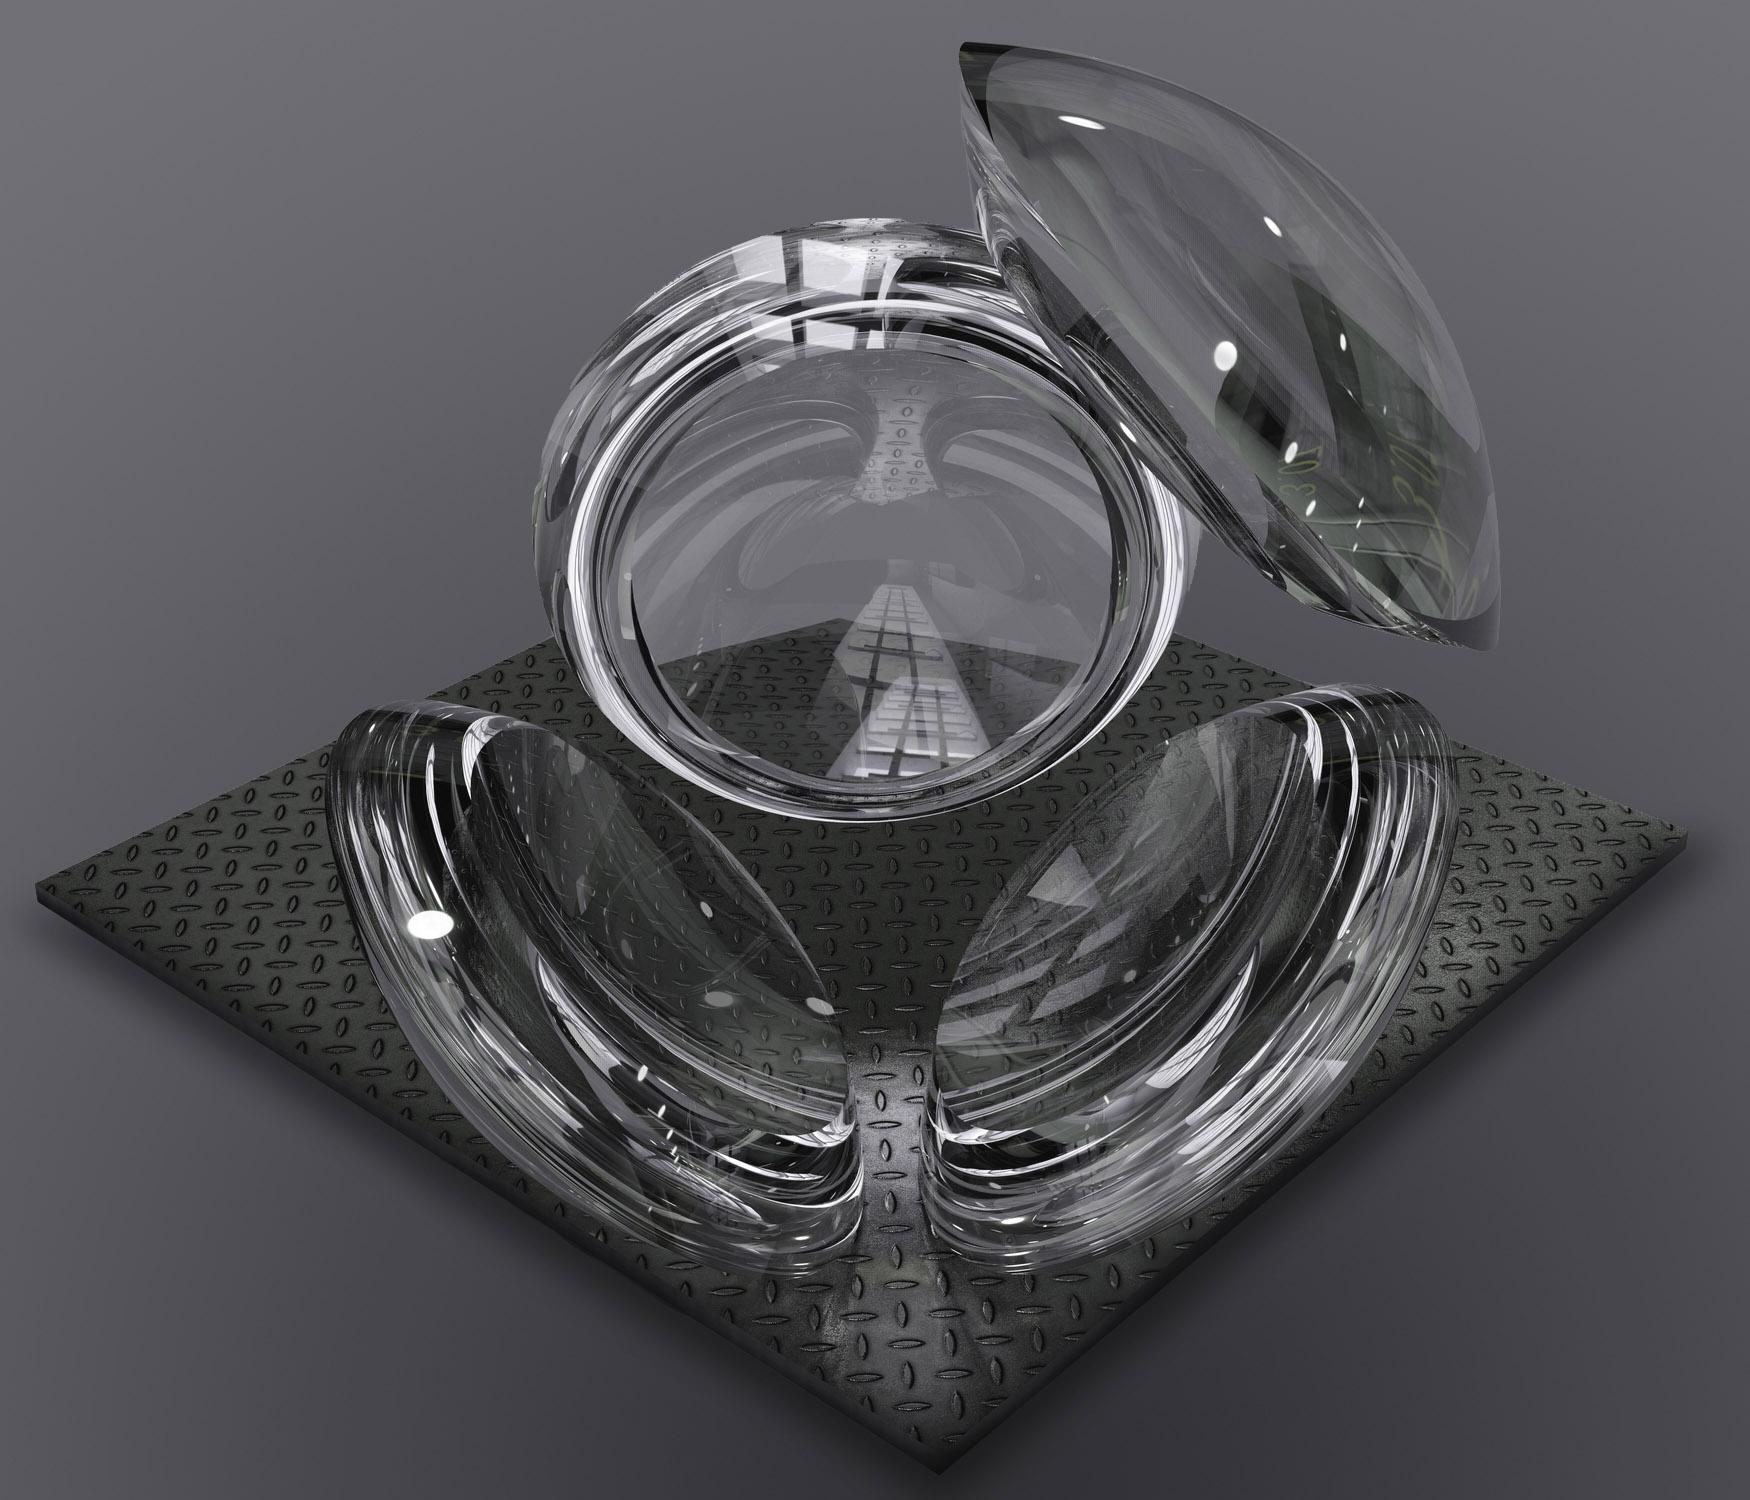 Multi Glass Reflection showcase